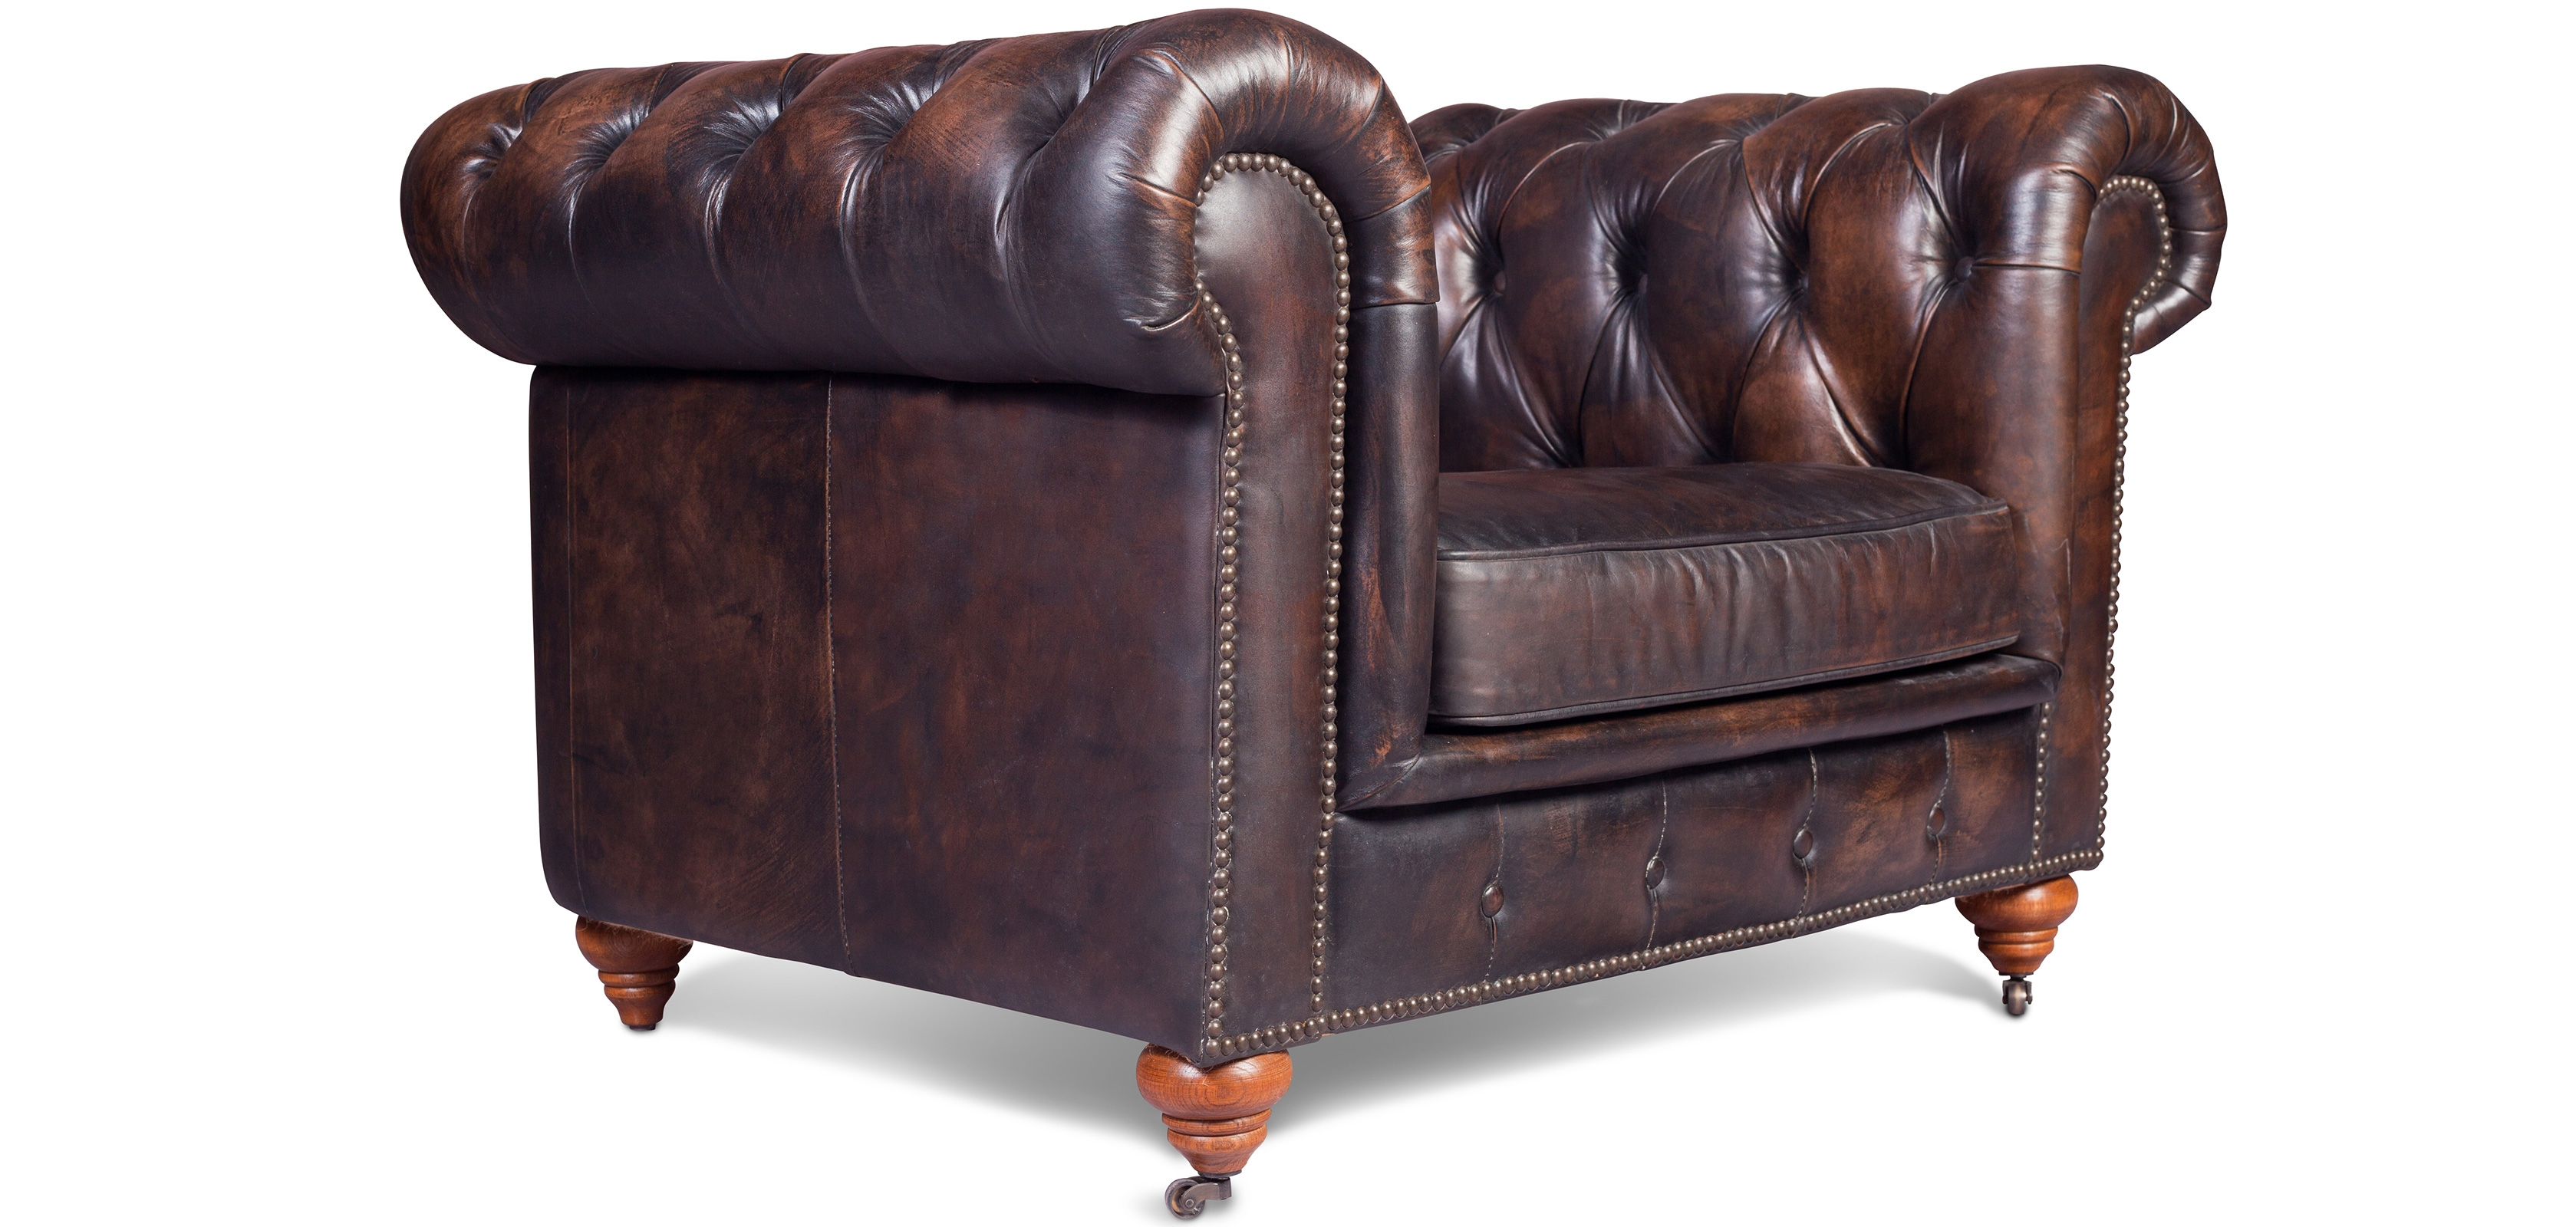 Buy Vintage Chesterfield Armchair - Premium Leather ...